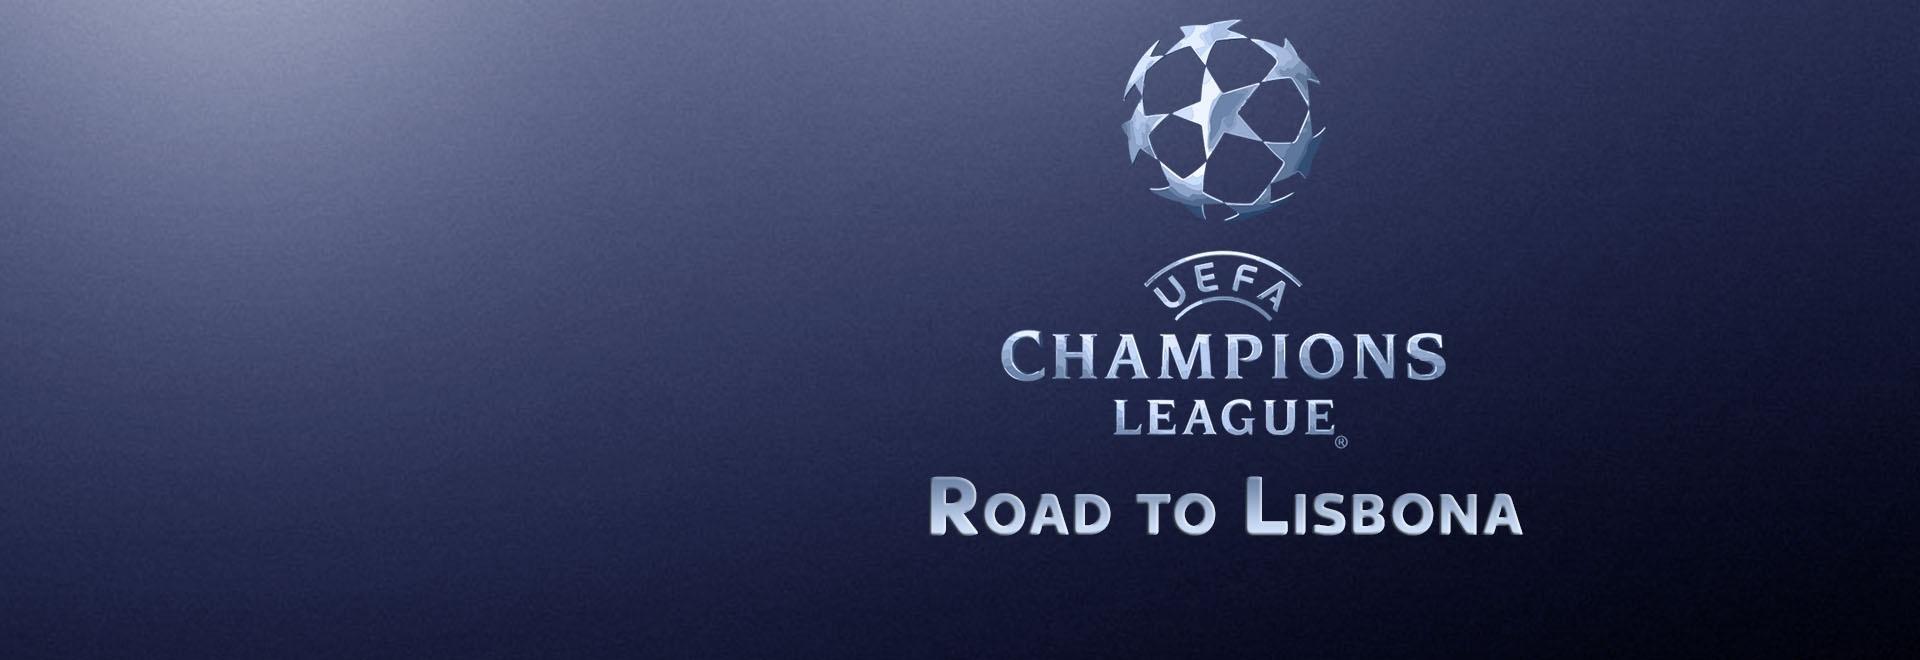 Road to Lisbona